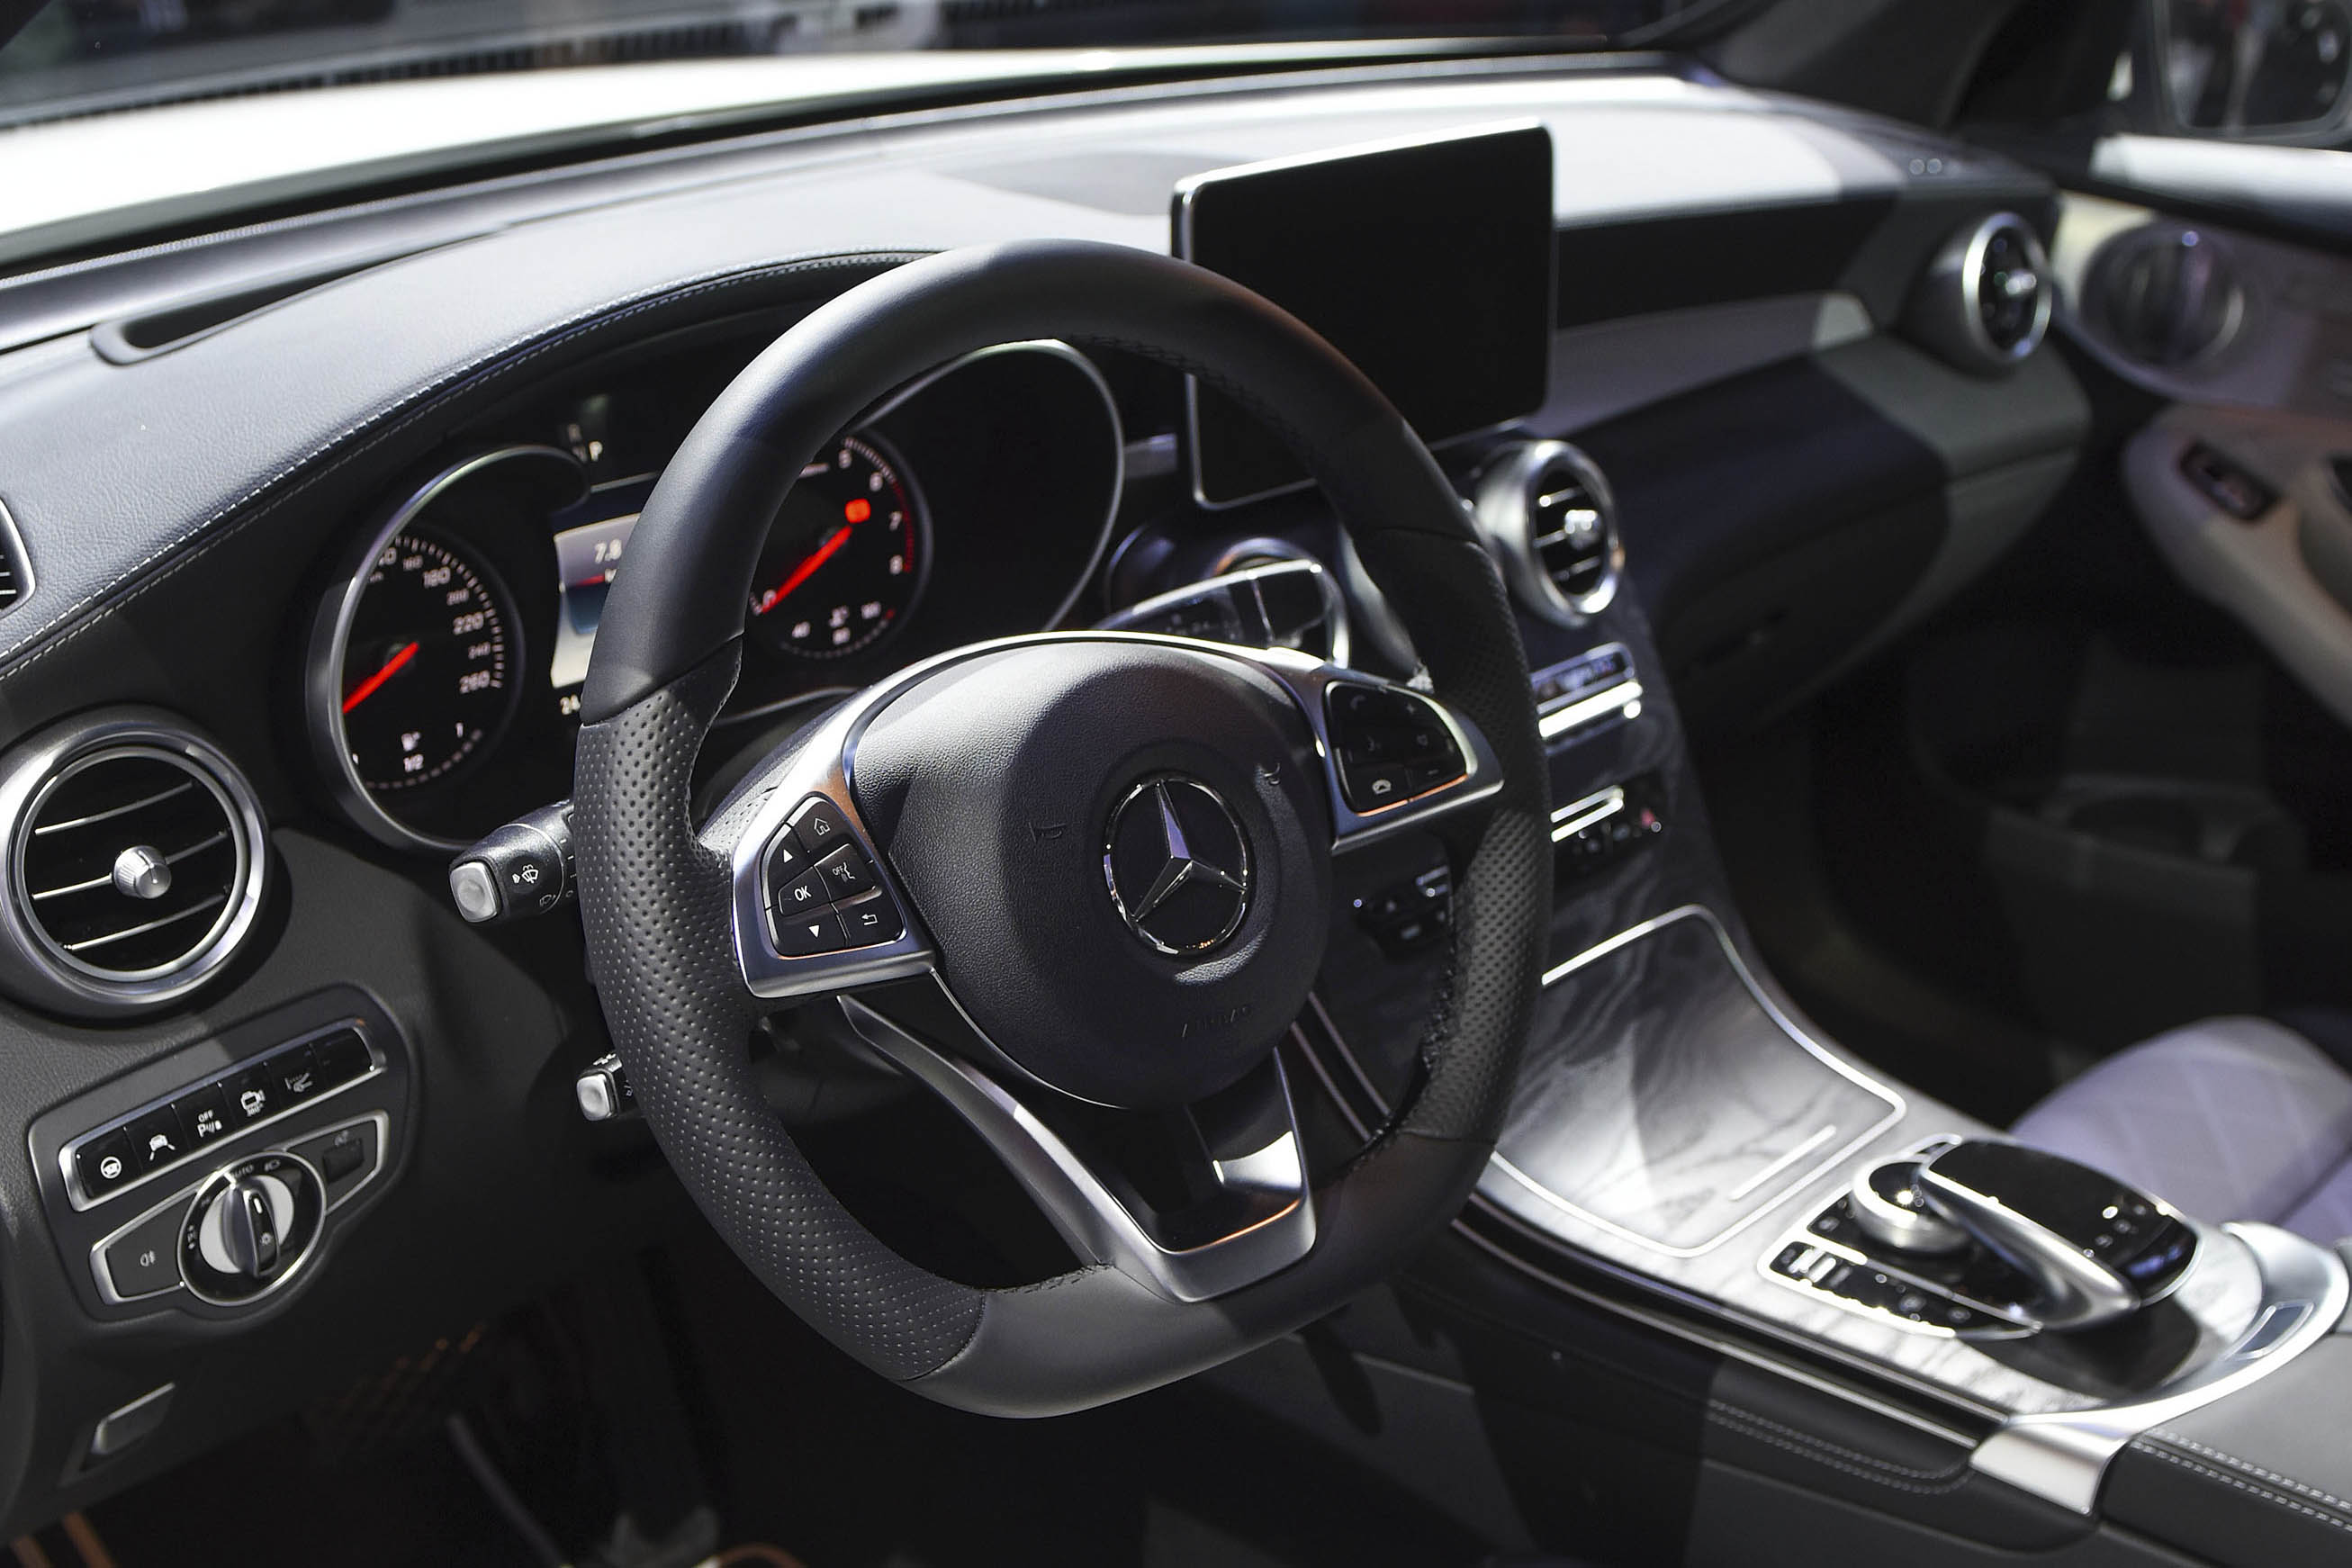 Interior of the GLC Coupe